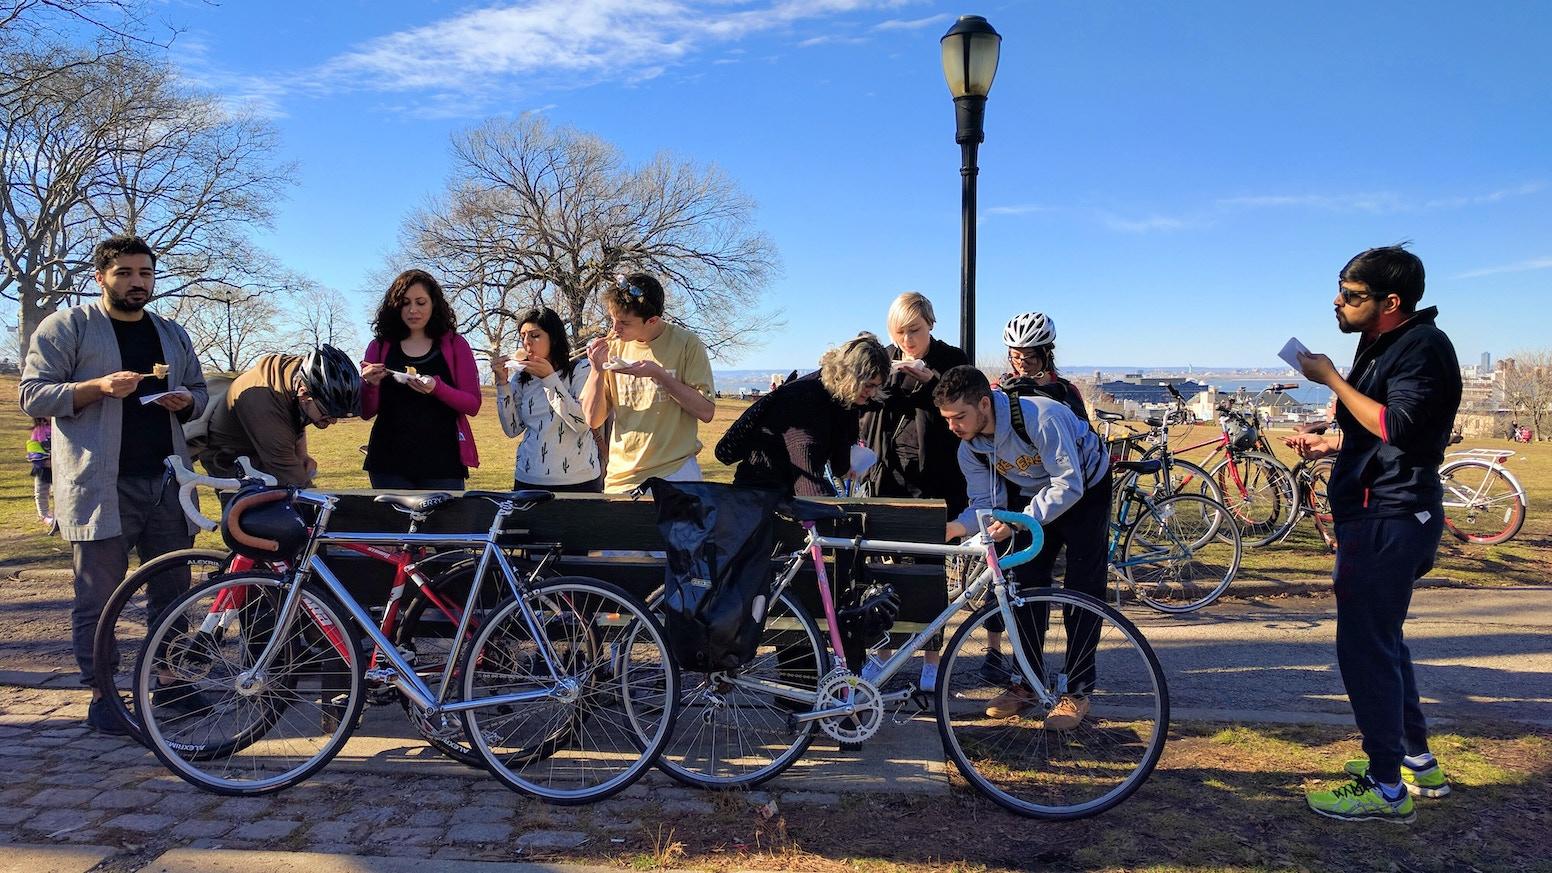 Celebrating biking, diversity, and local businesses.